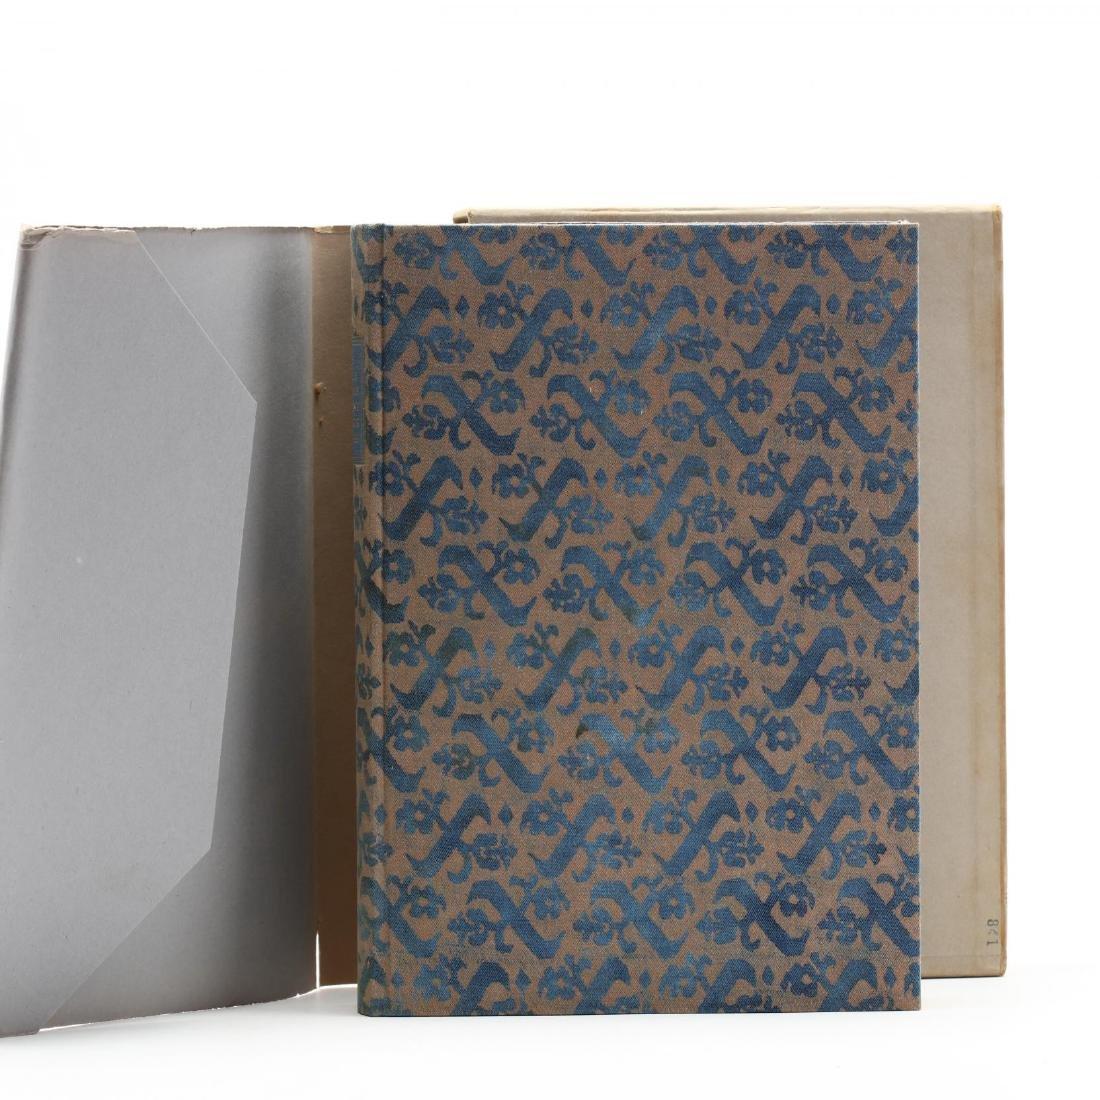 Three Prewar Limited Editions Club Slipcased Books With - 4